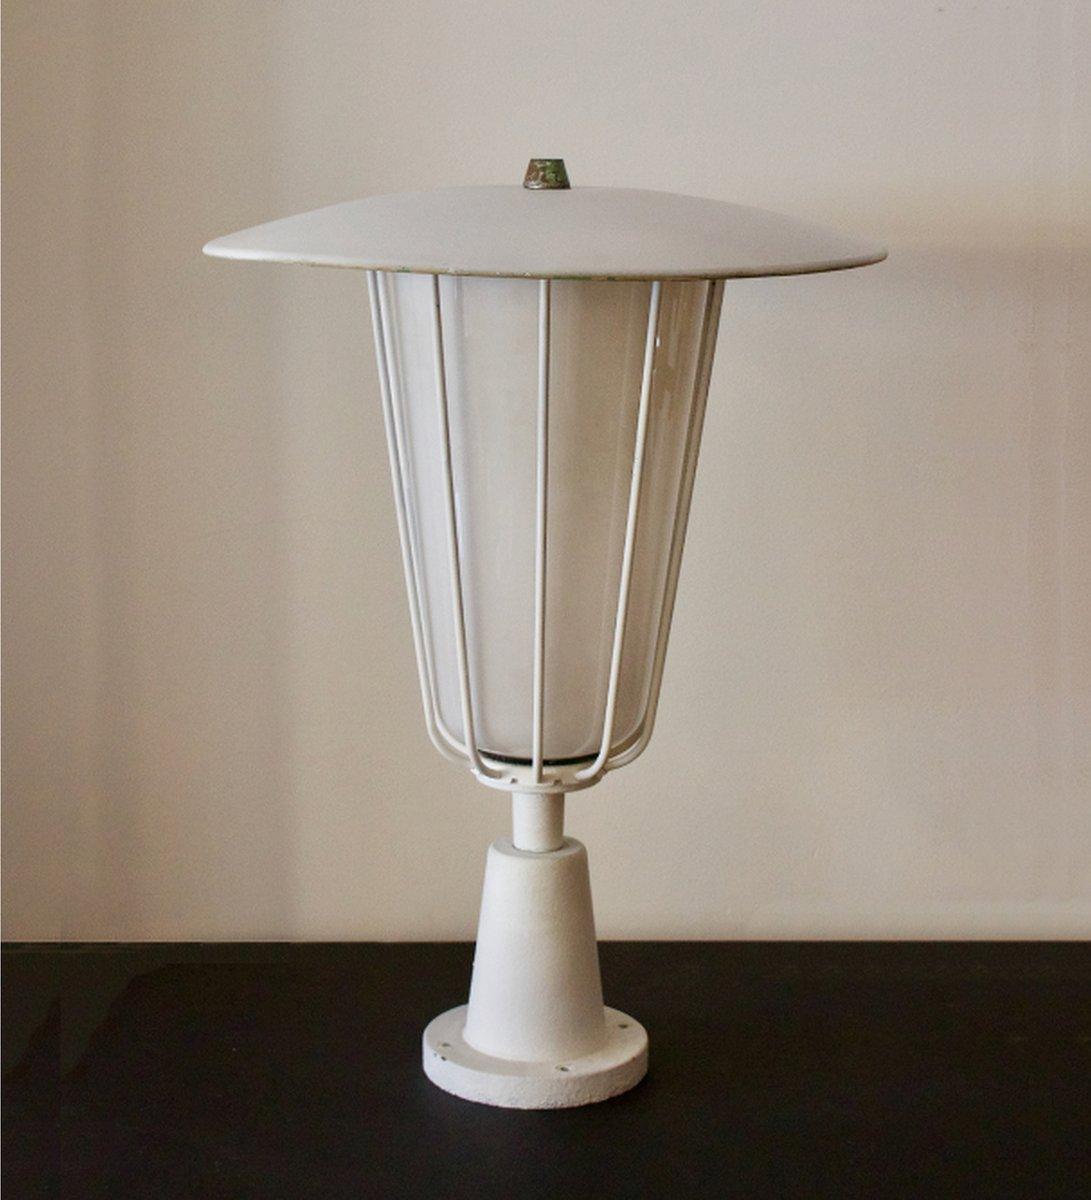 Lanterna da giardino grande vintage con paralume in vetro opalino di ...